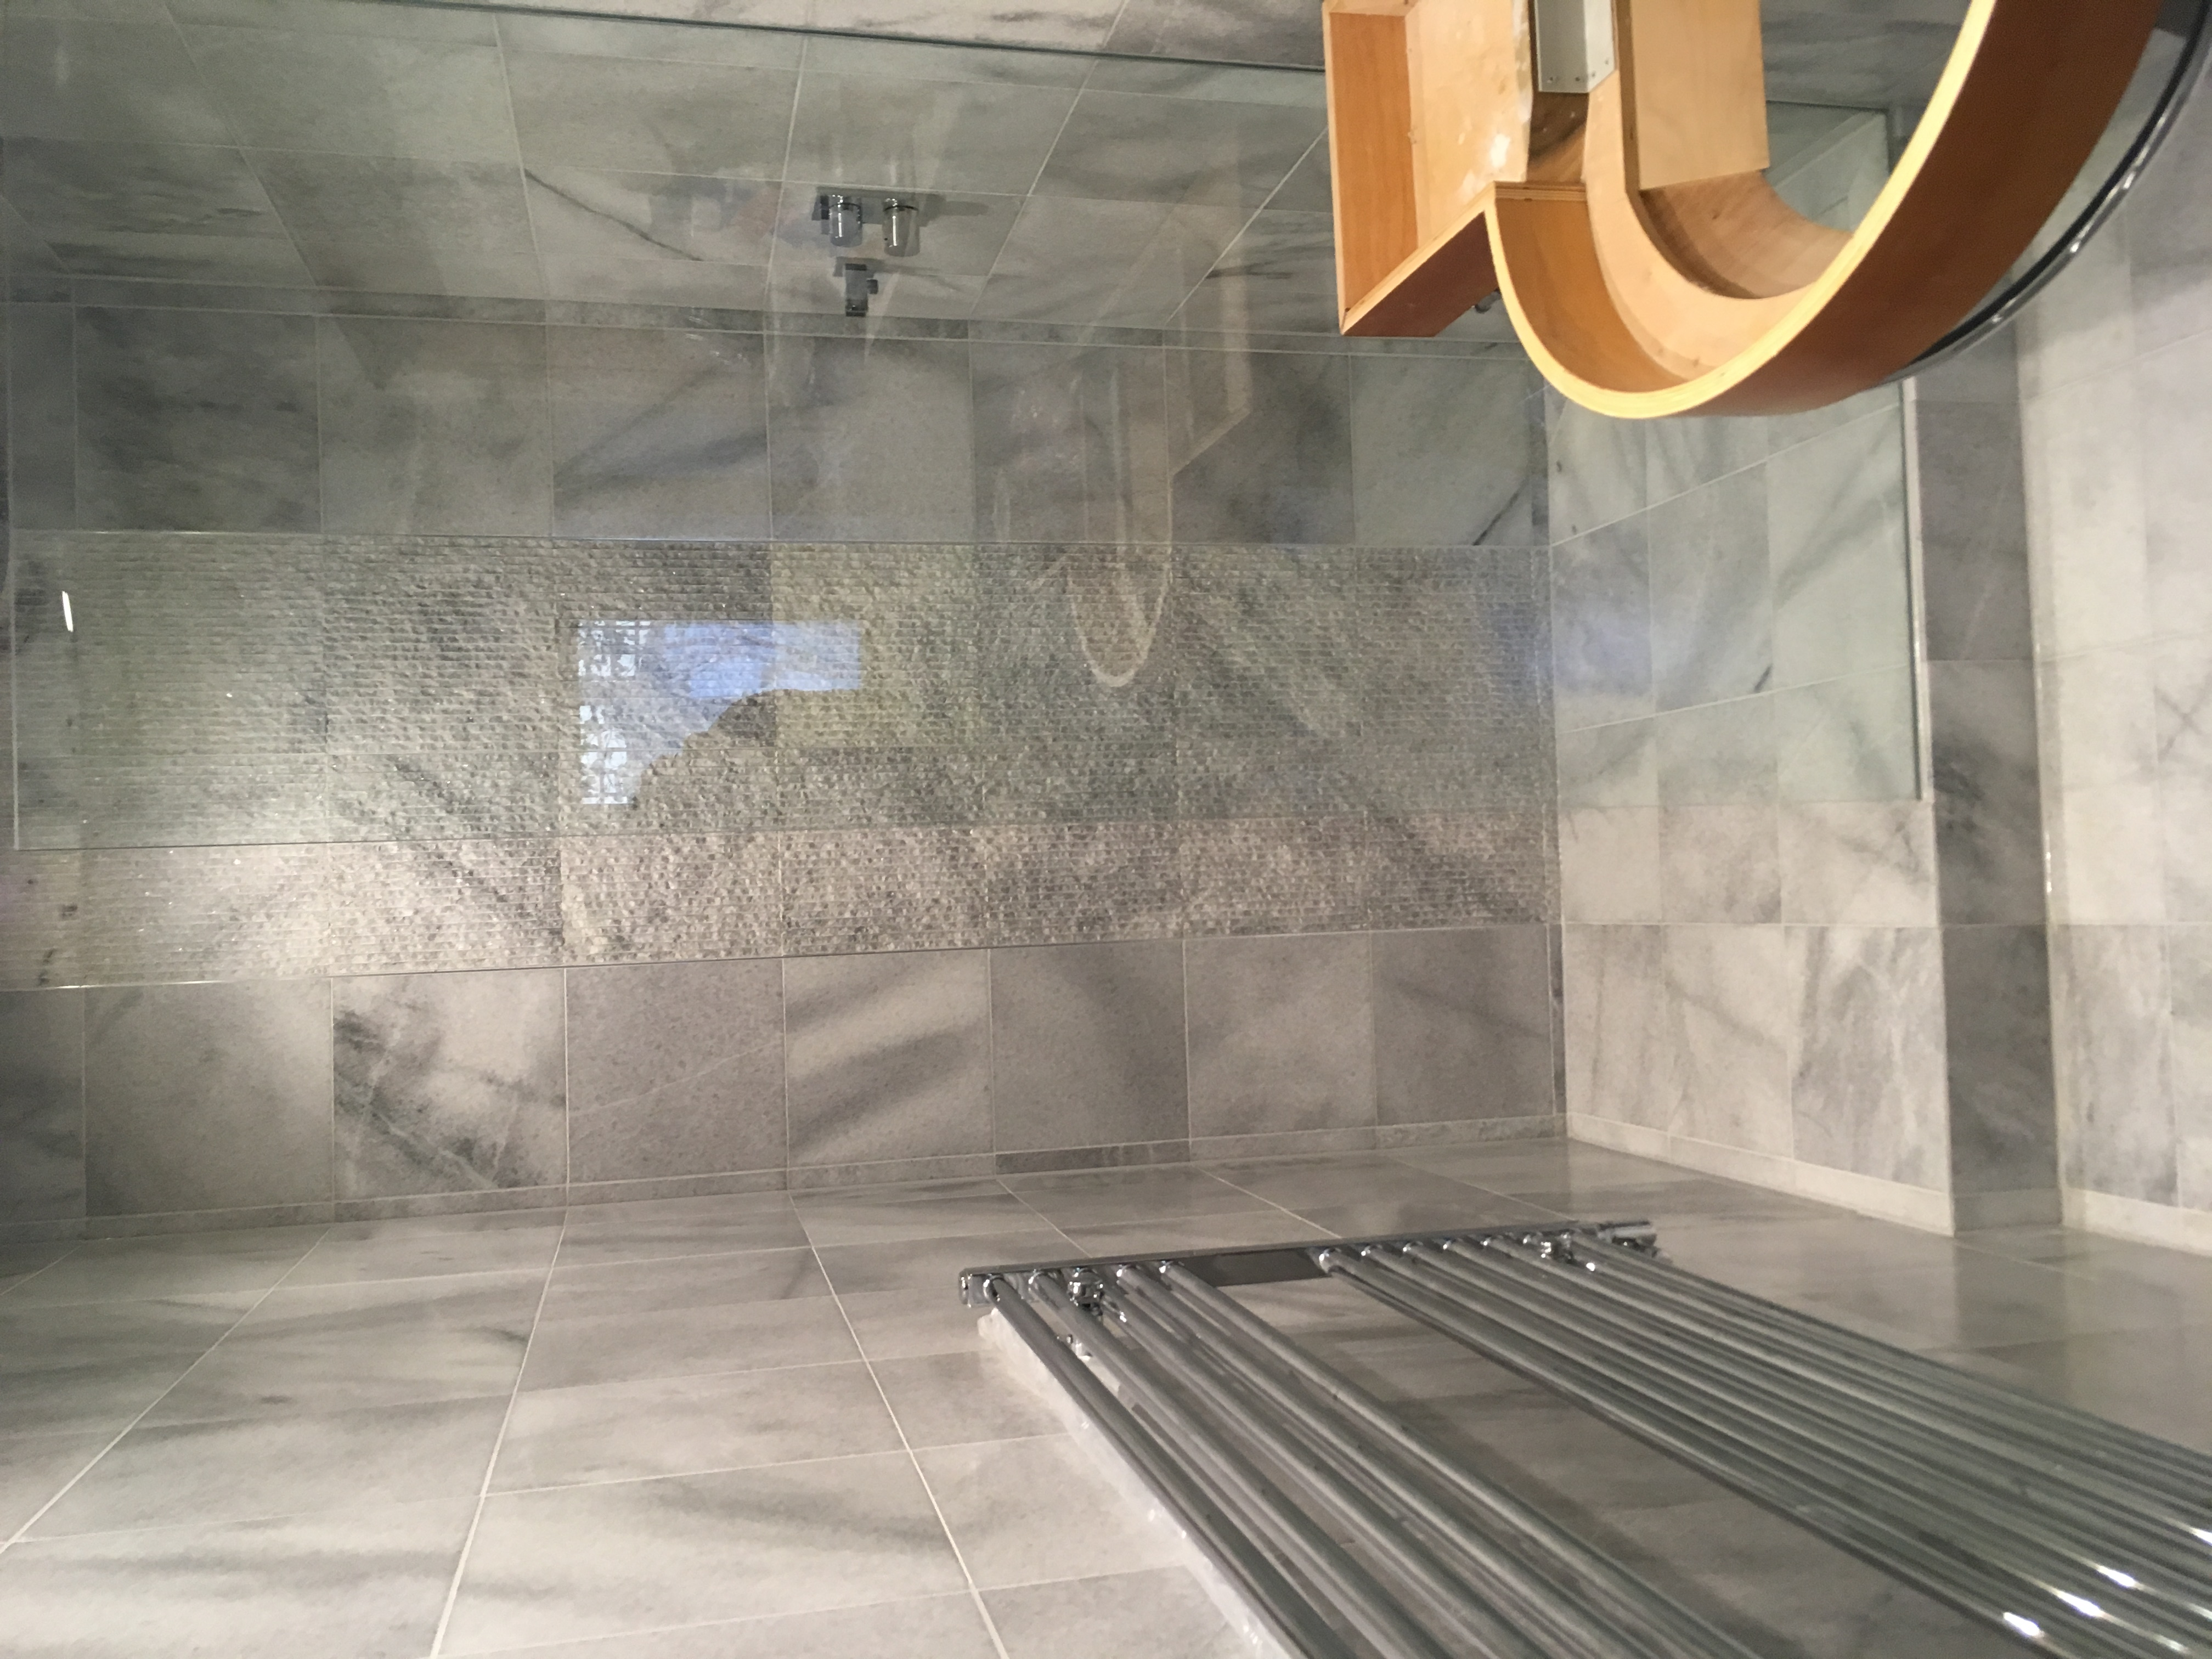 Cristal white marble bathroom tiles (1)